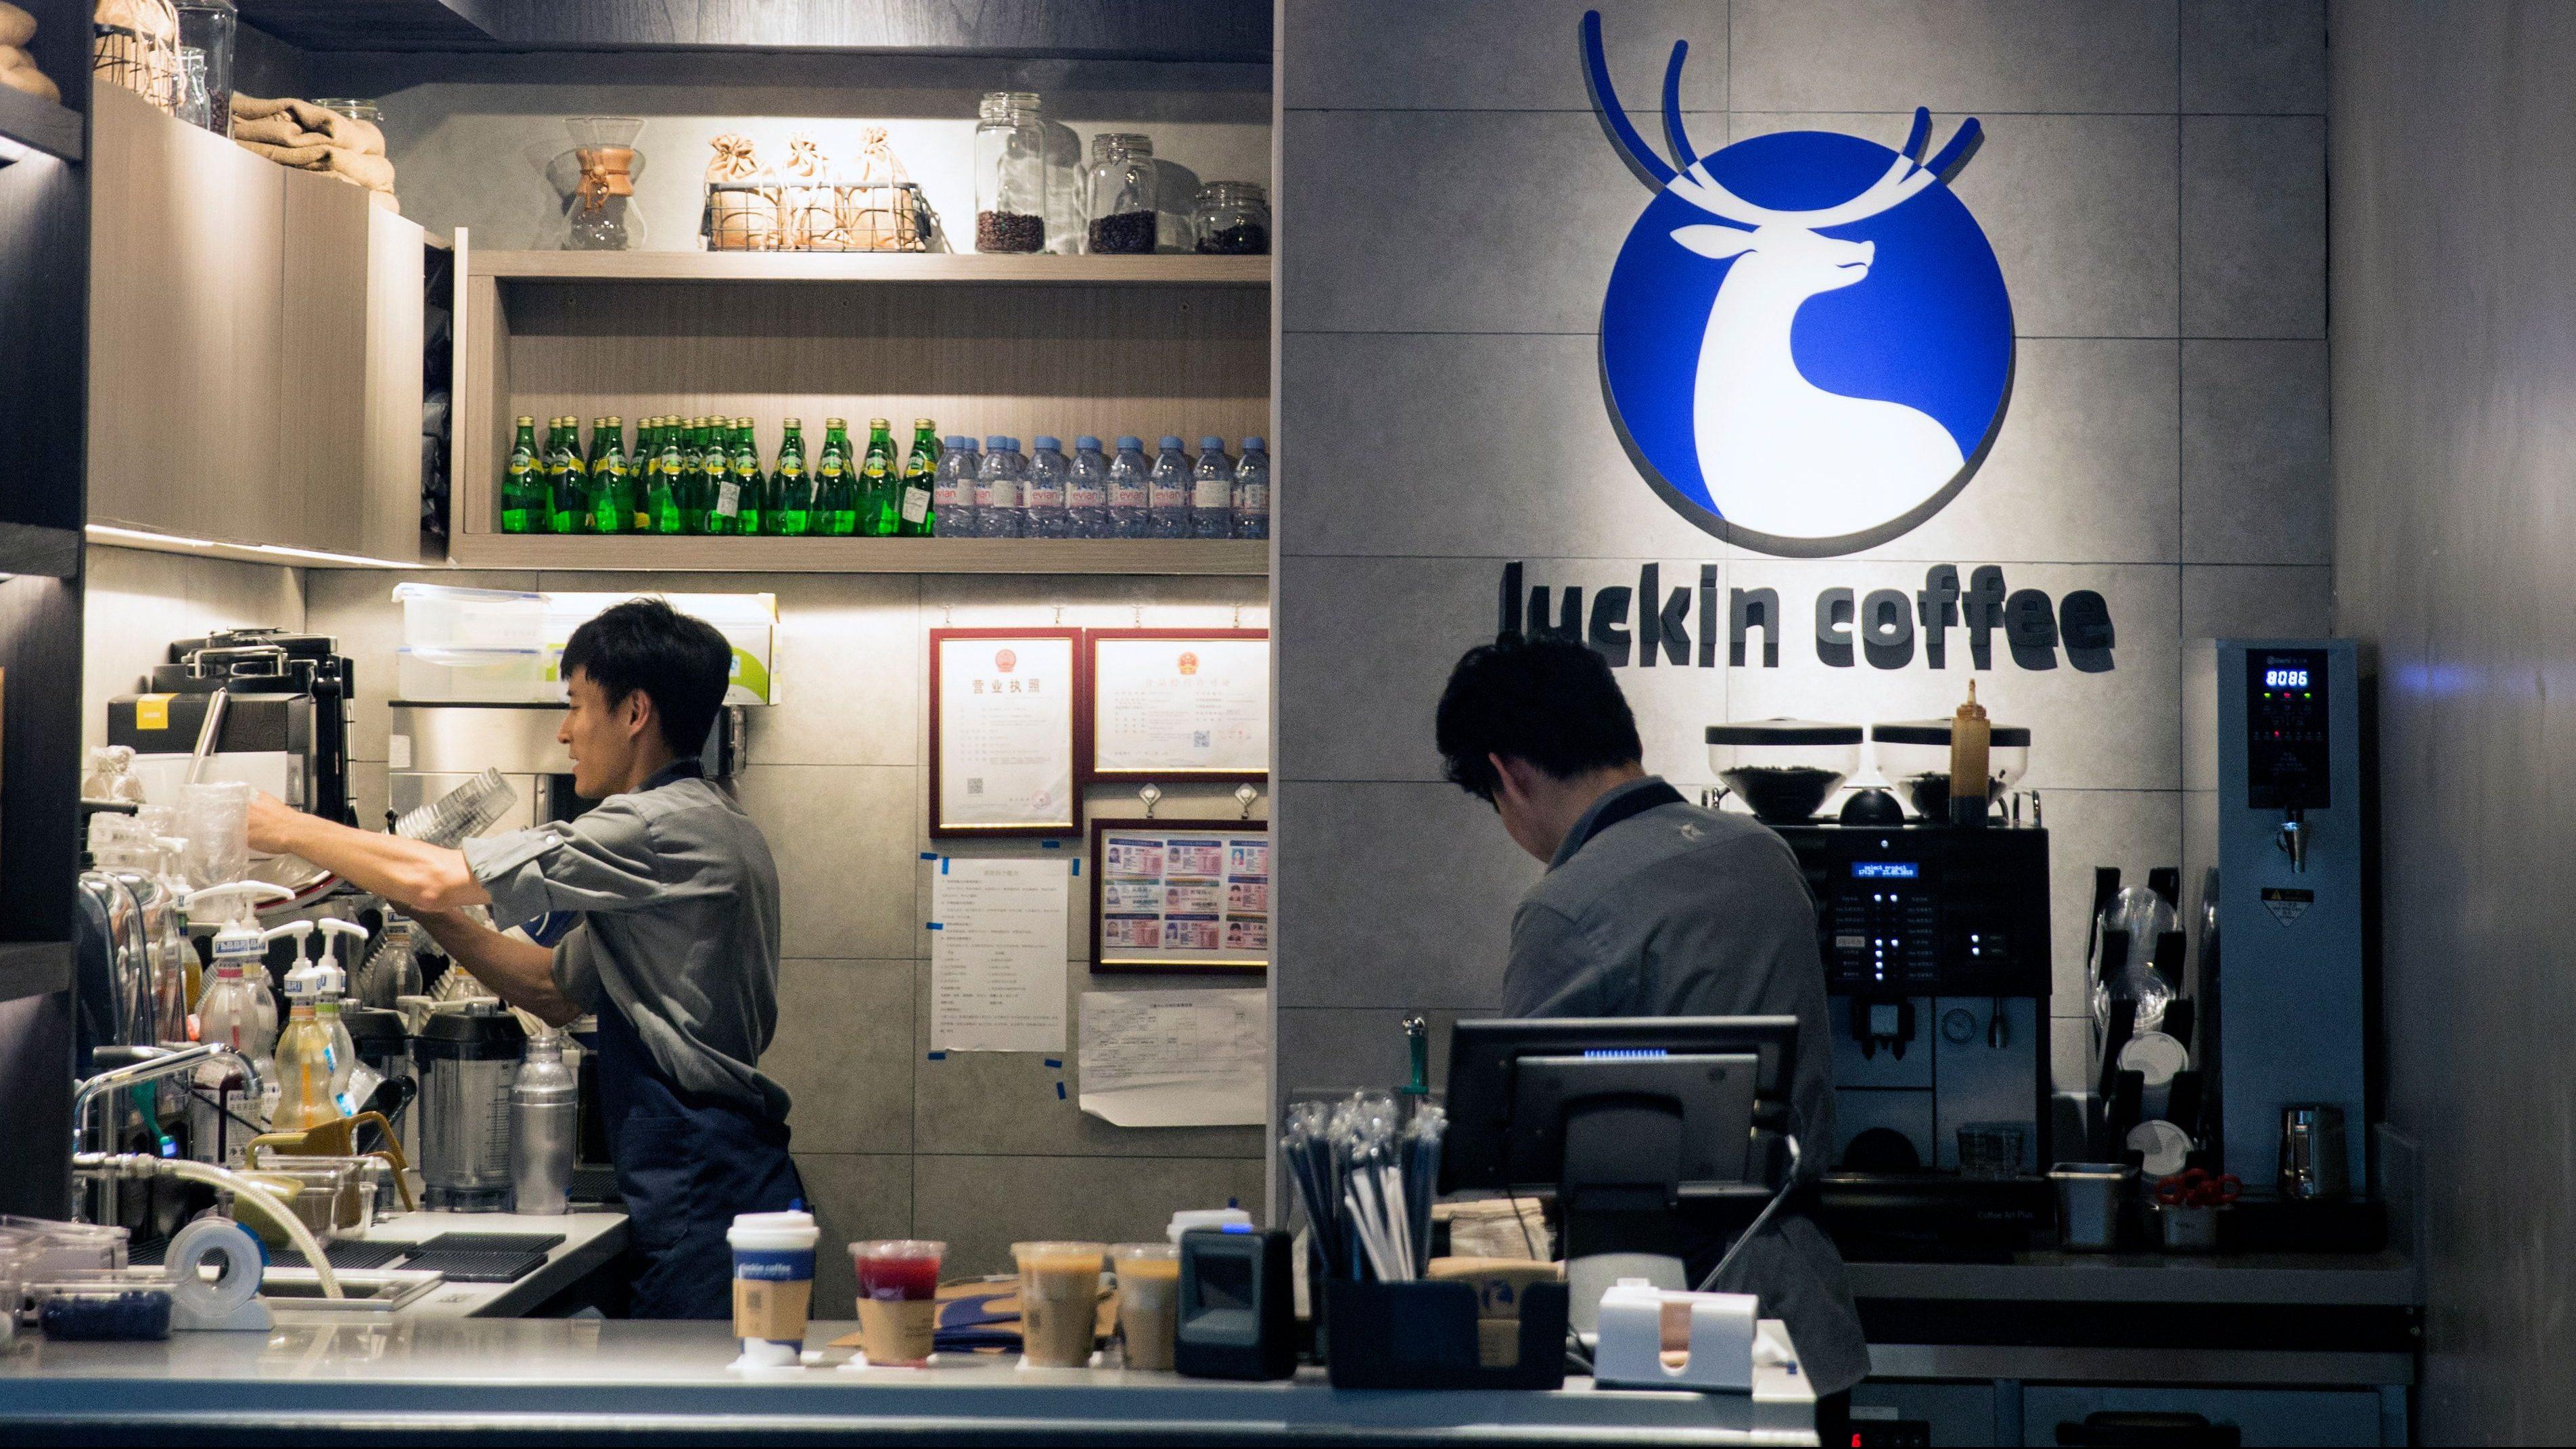 Luckin Coffee startup challenging Starbucks in China worth